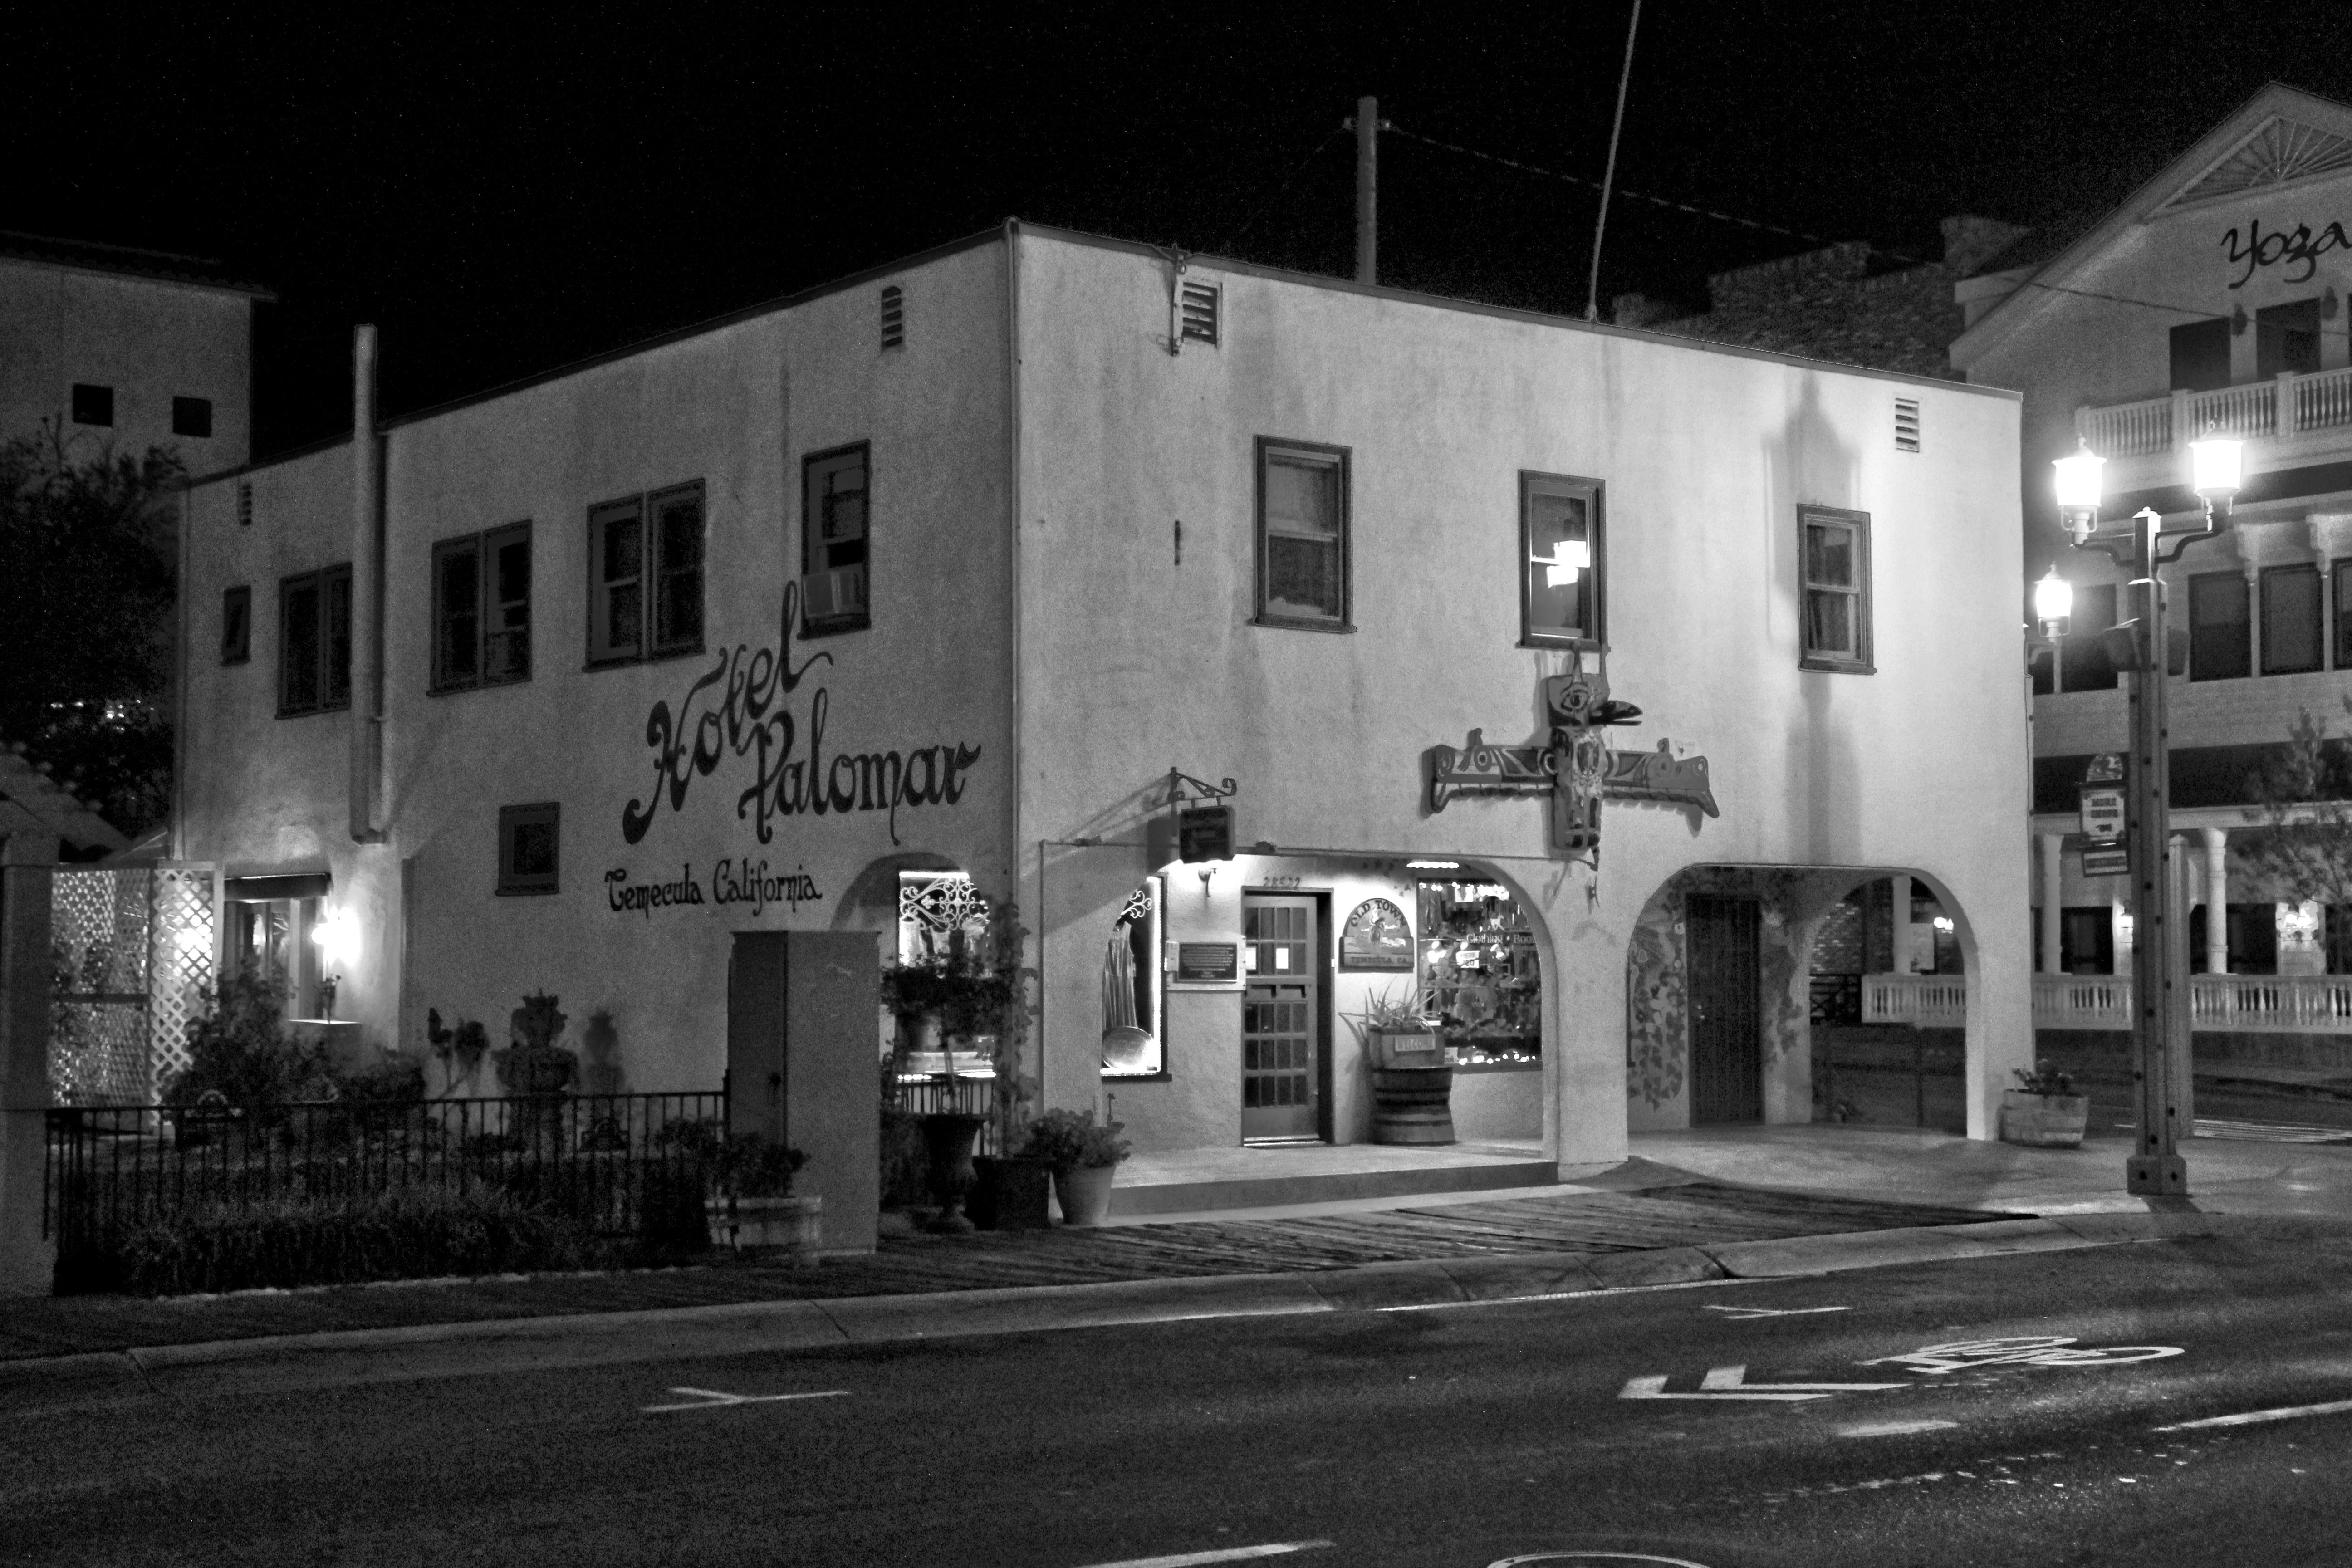 The haunted Palomar Inn Hotel in Temecula. CA.